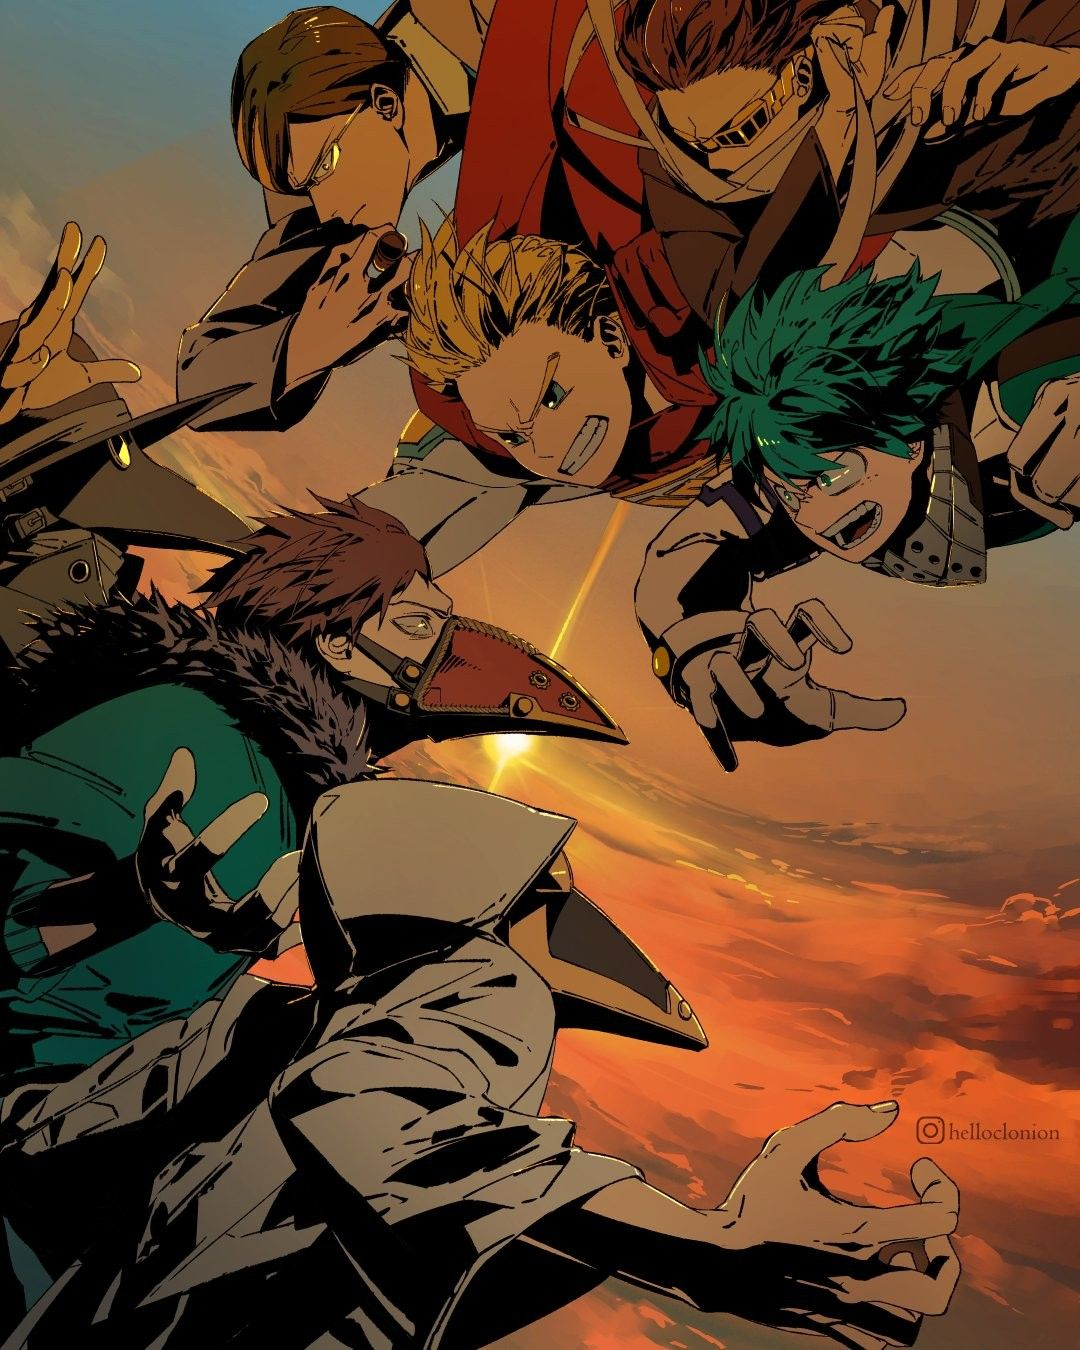 "Hero Vs Shie Hassaikai Helloclonion Hero Wallpaper My Hero Boku No Hero Academia Zobacz wybrane przez nas produkty dla hasła ""shie hassaikai: my hero boku no hero academia"